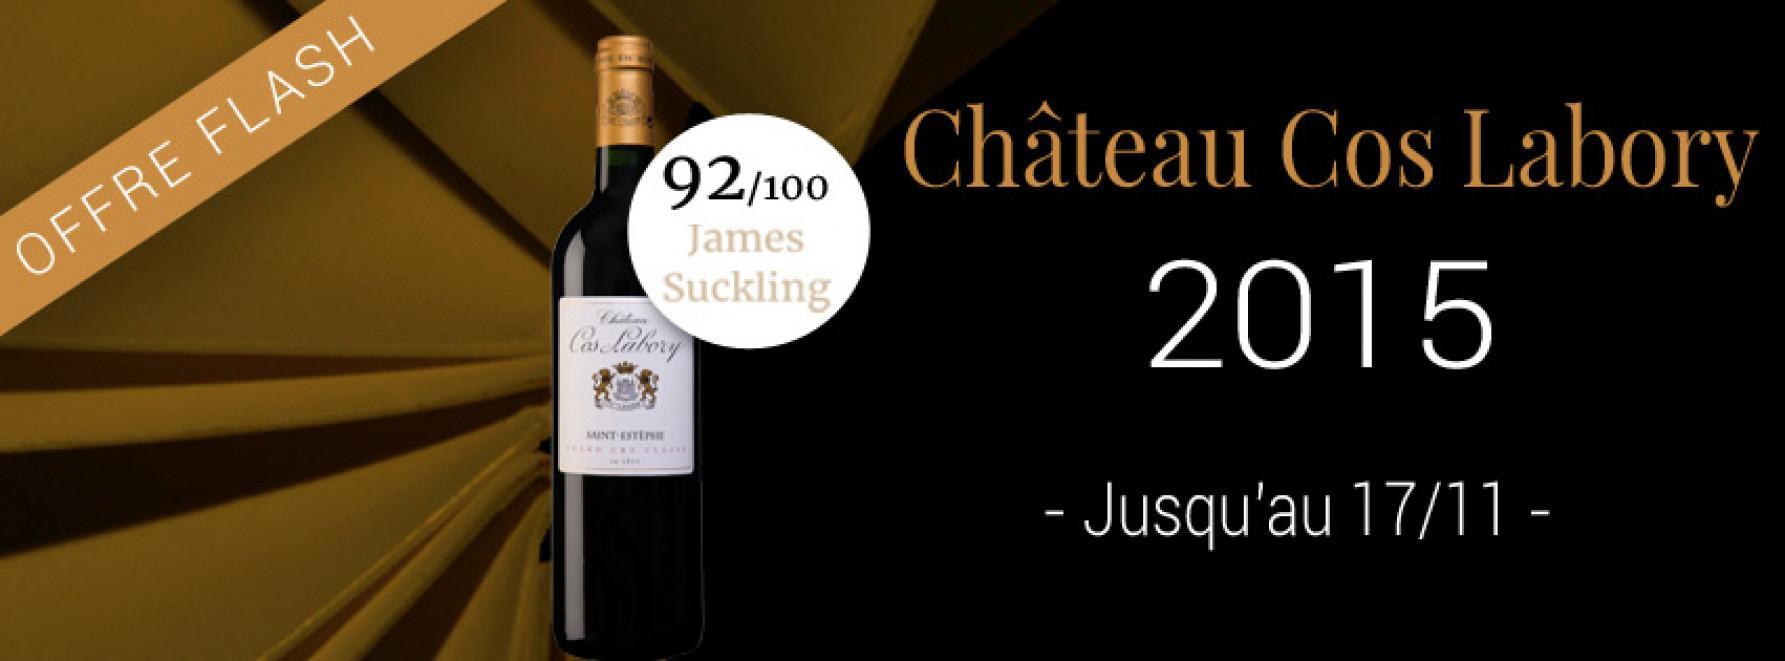 Offre Flash - Château Cos Labory 2015